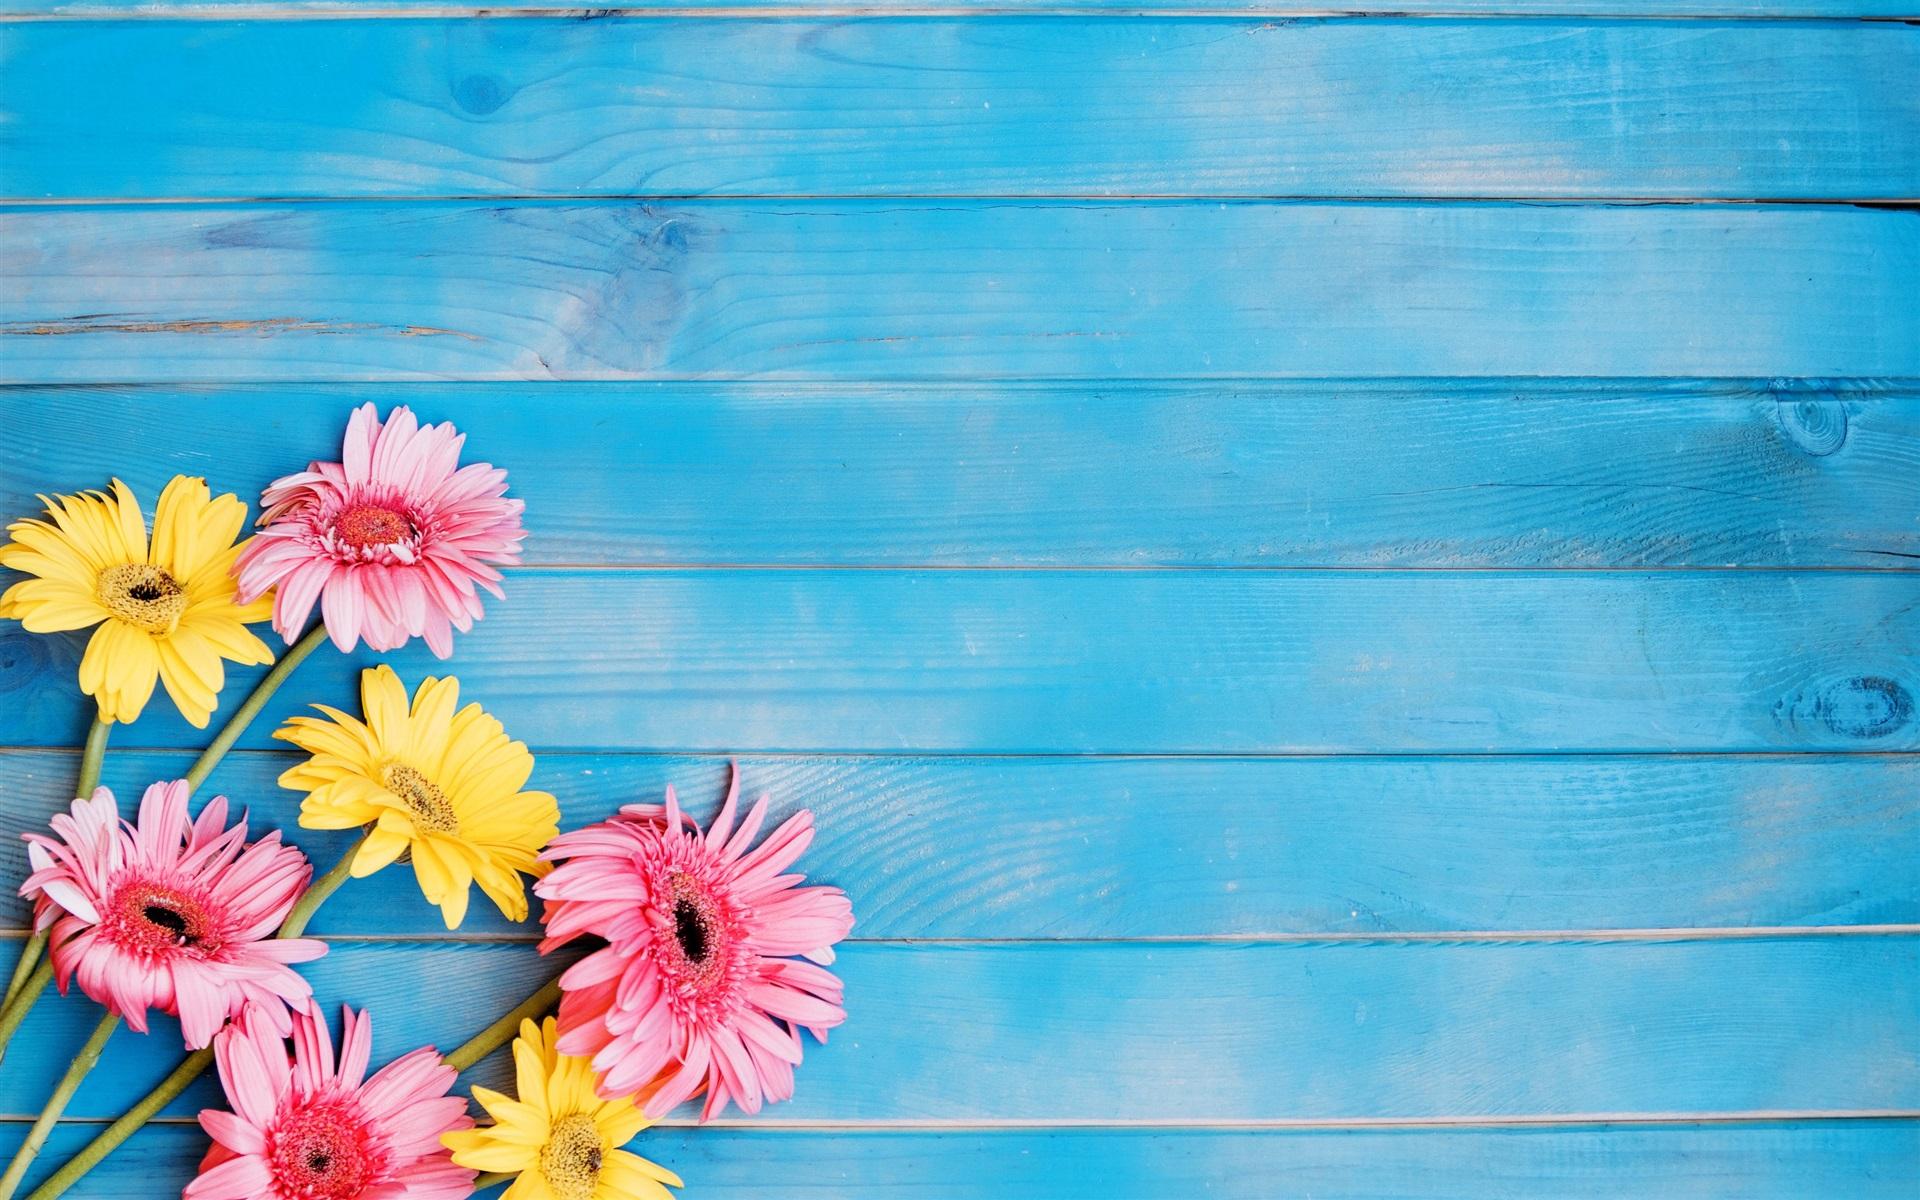 Madera Con Flores Fondos T Wallpaper Iphone Wallpaper